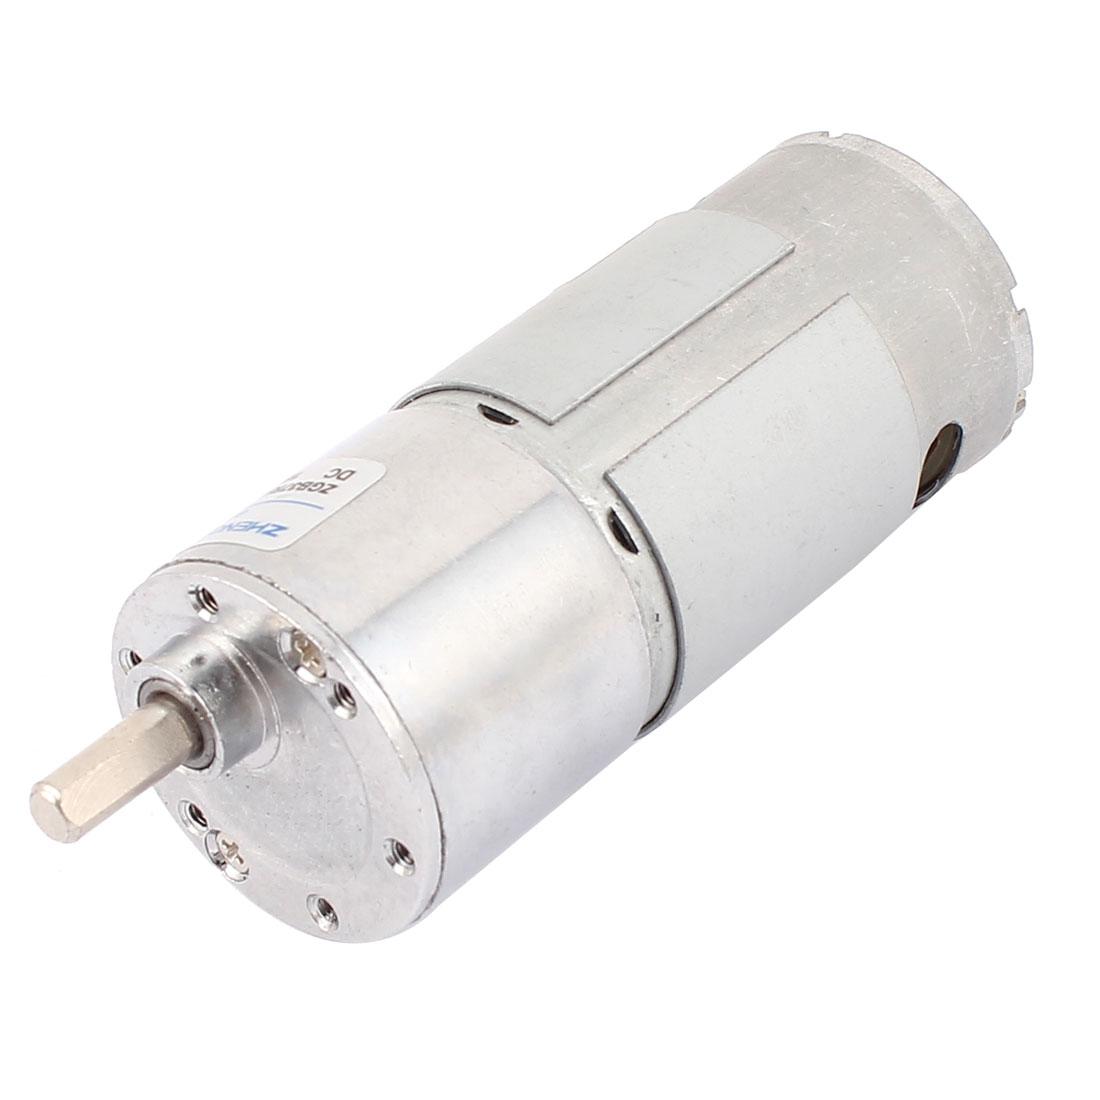 12V 45RPM High Torque 2 Terminal 6mm Dia D Shape Shaft Reducer Micro DC Geared Gear Box Electric Motor